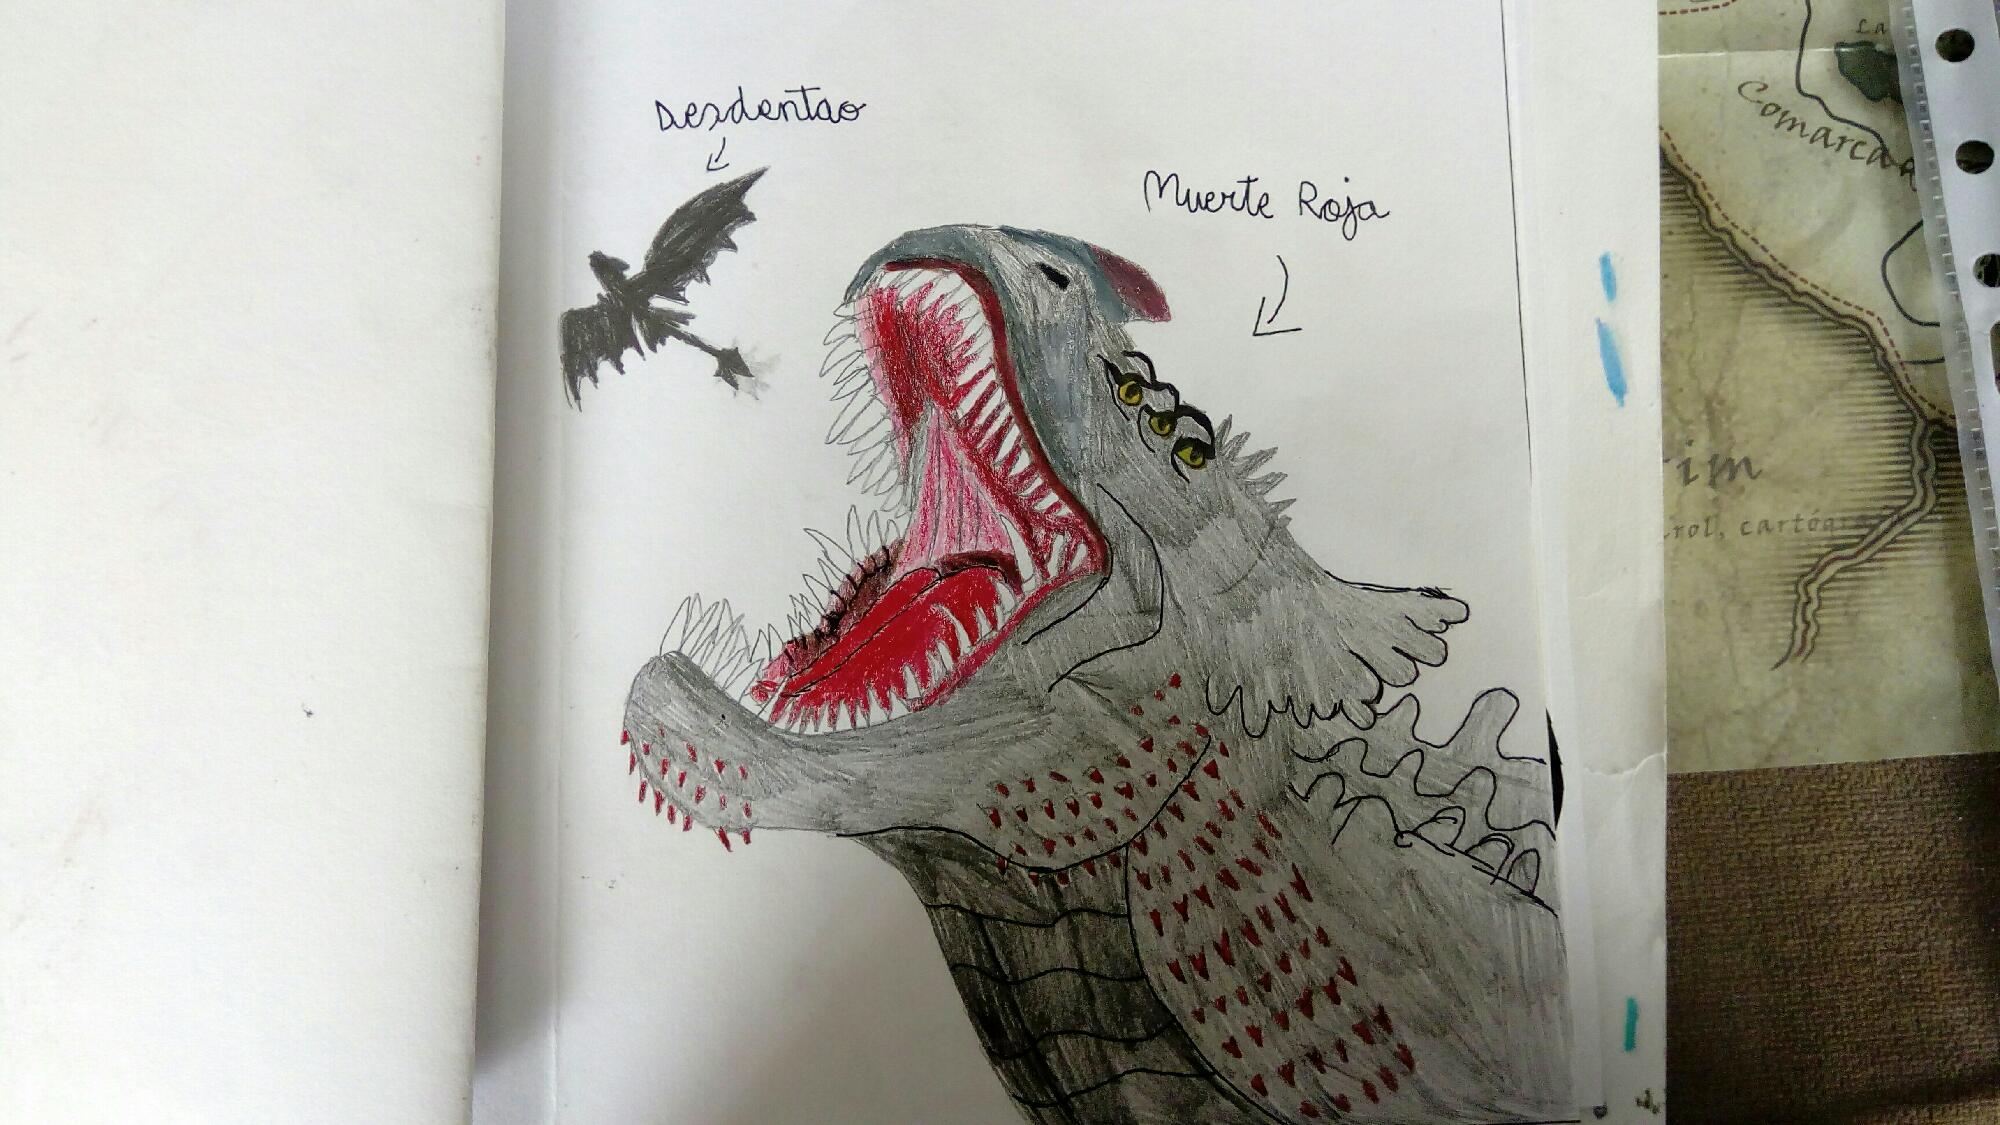 Dibujo libro de dragones: muerte roja vs desdentao (chimuelo)